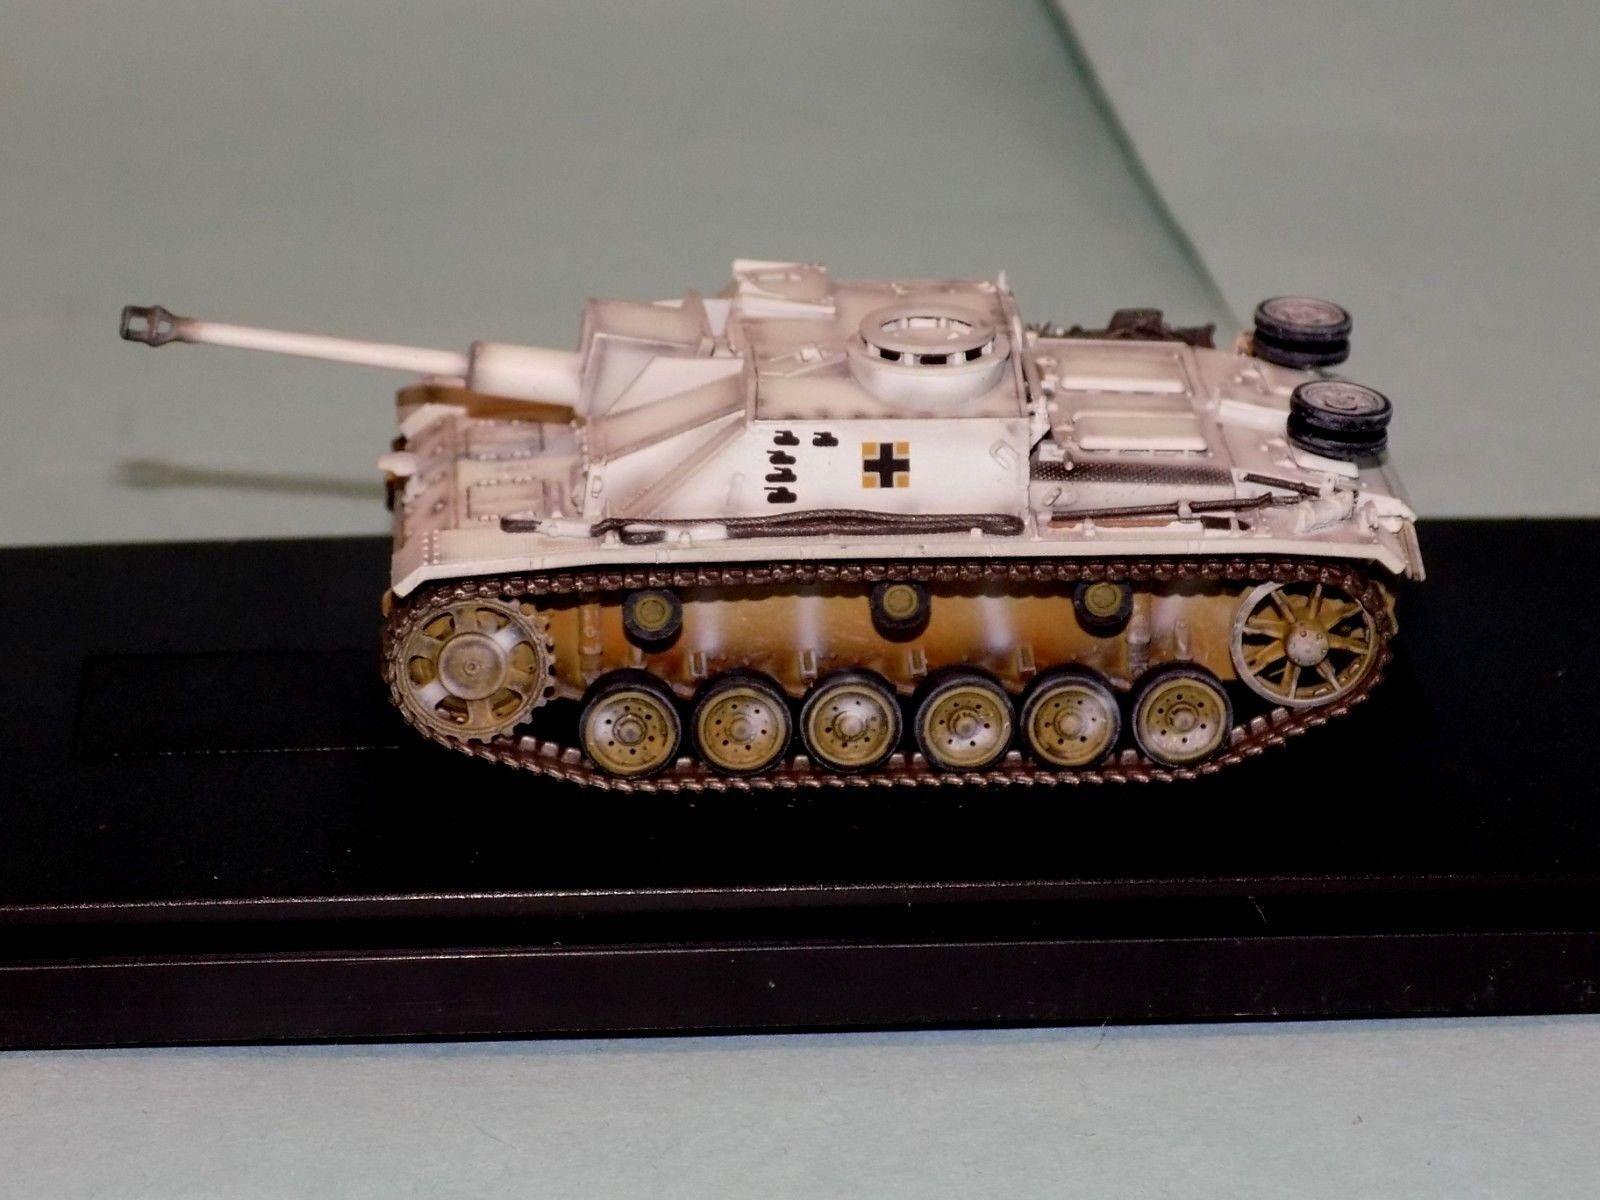 Alemán StuG III Ausf. G temprano. Prod. Ucrania 1944 World War Two armadura de dragón 60312 1 72